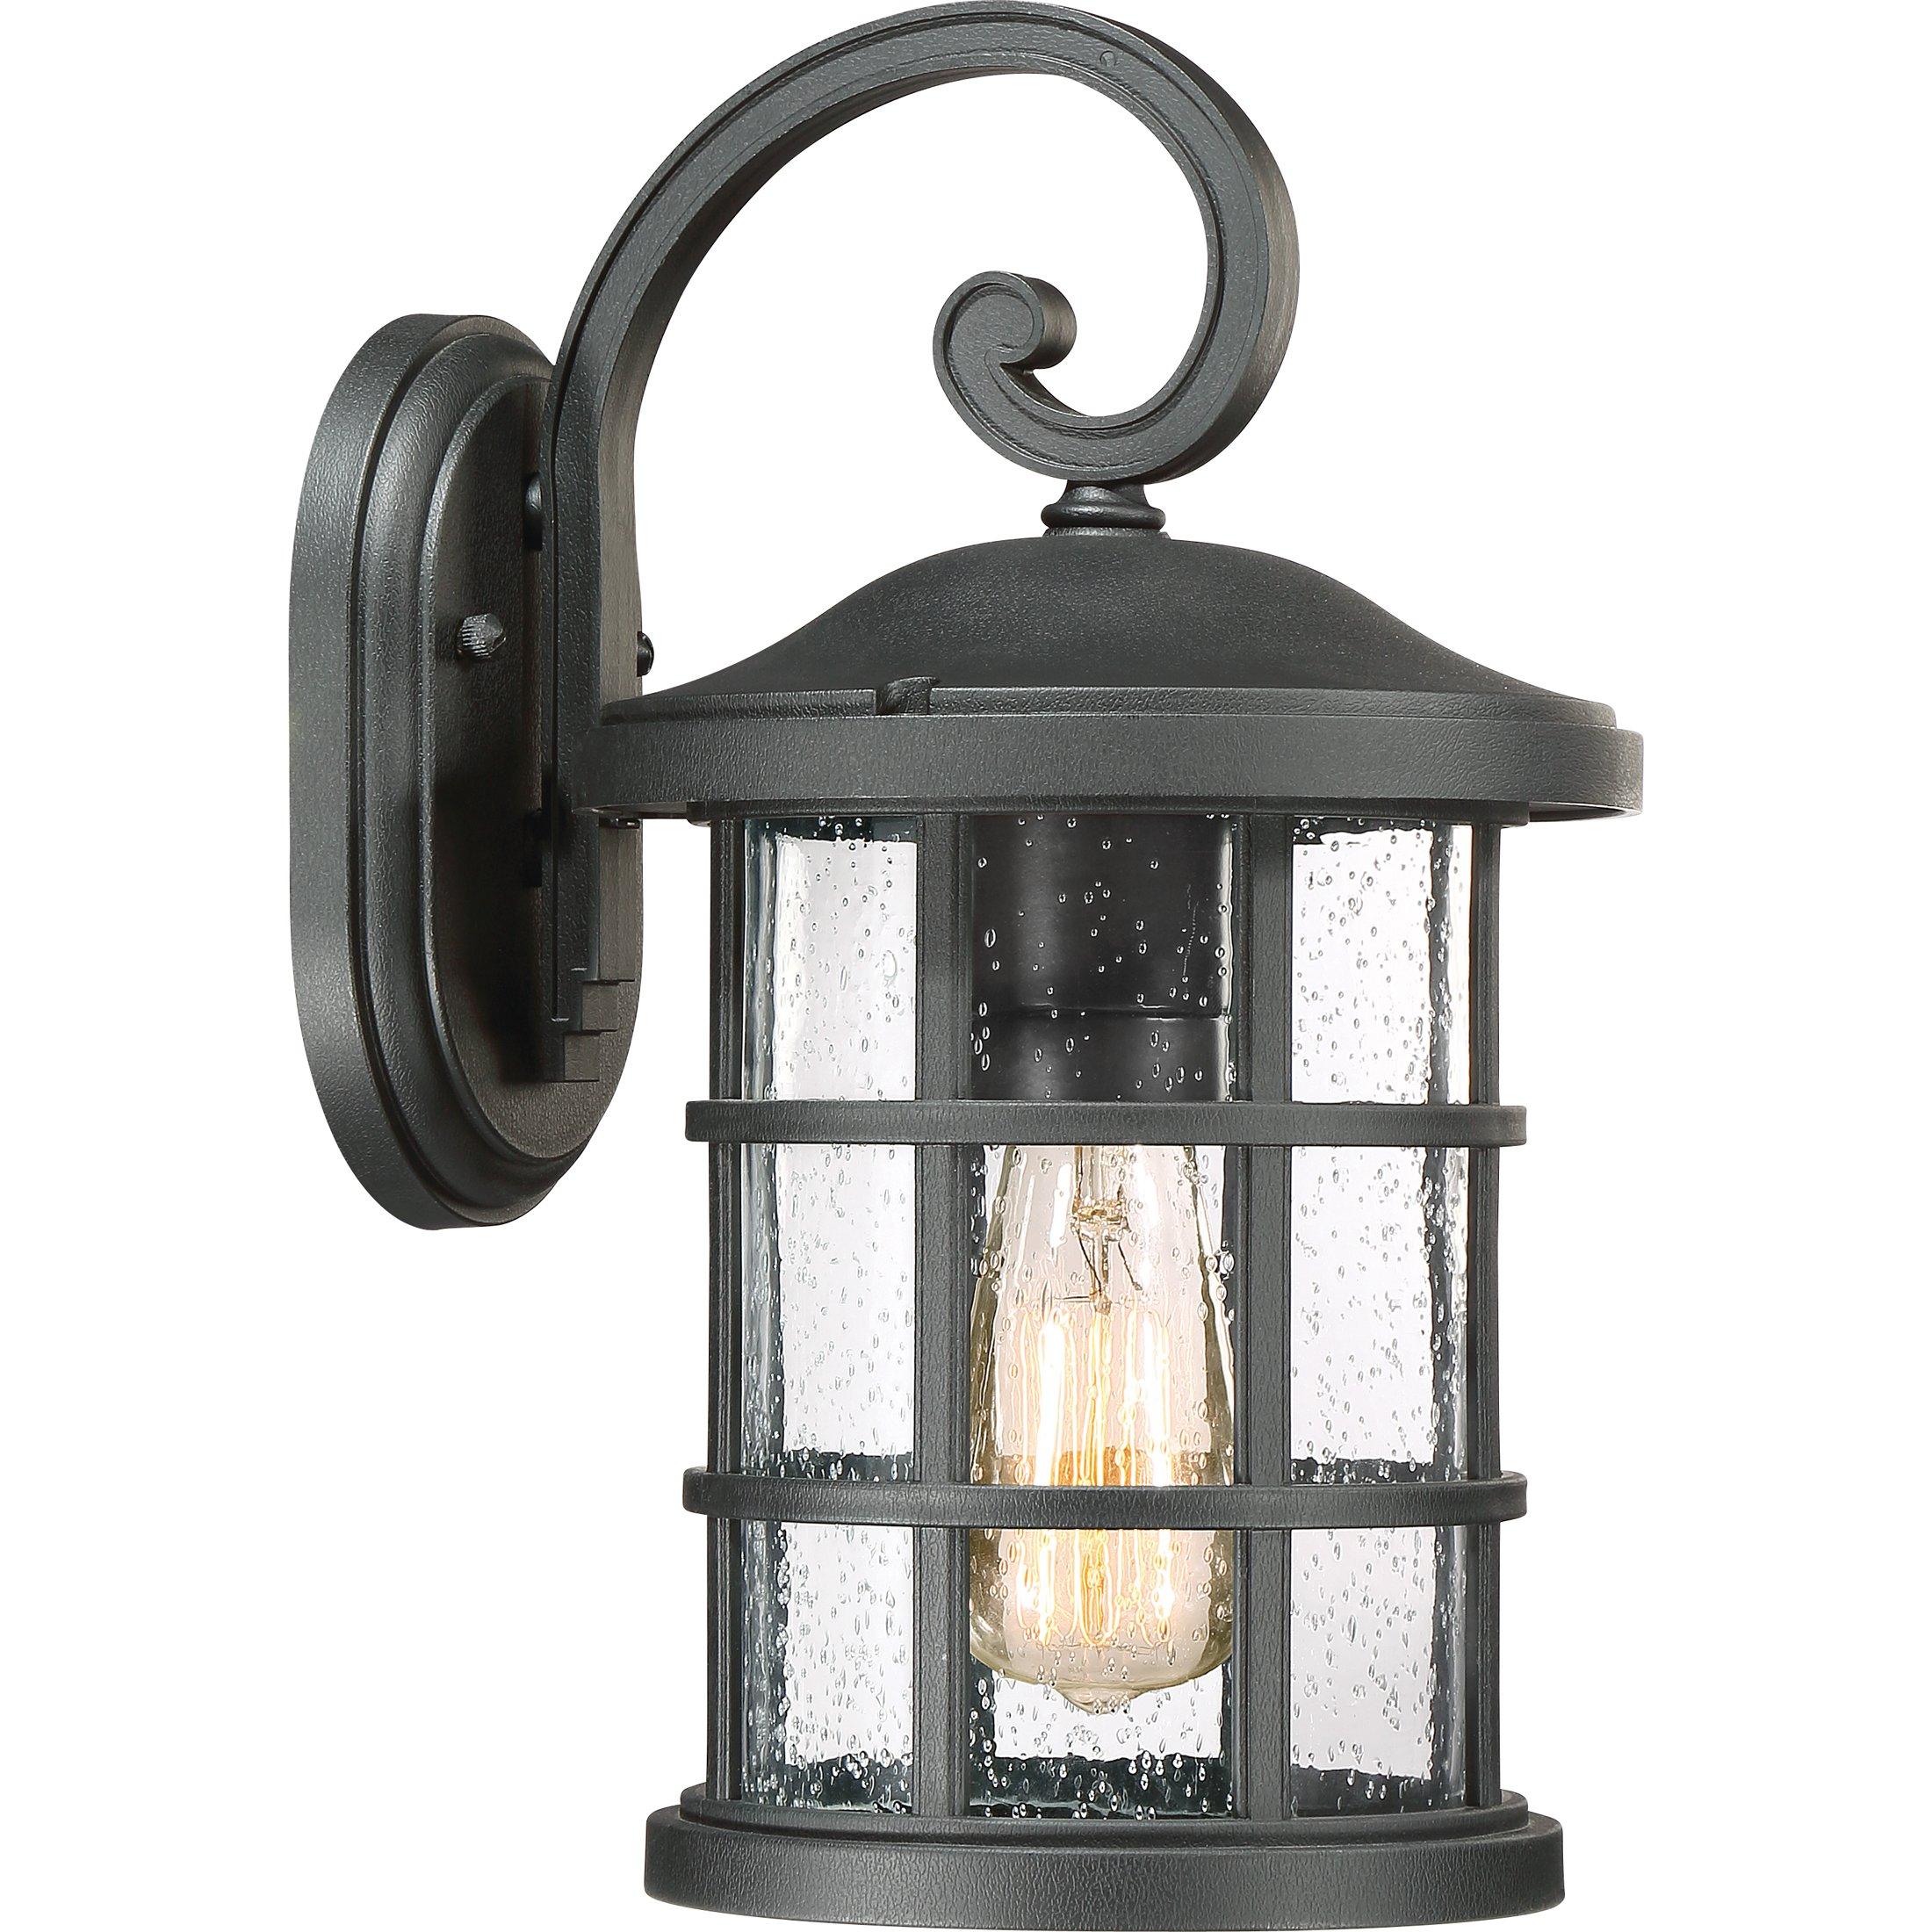 Quoizel One Light Outdoor Wall Lantern CSE8408EK, Medium, Earth Black